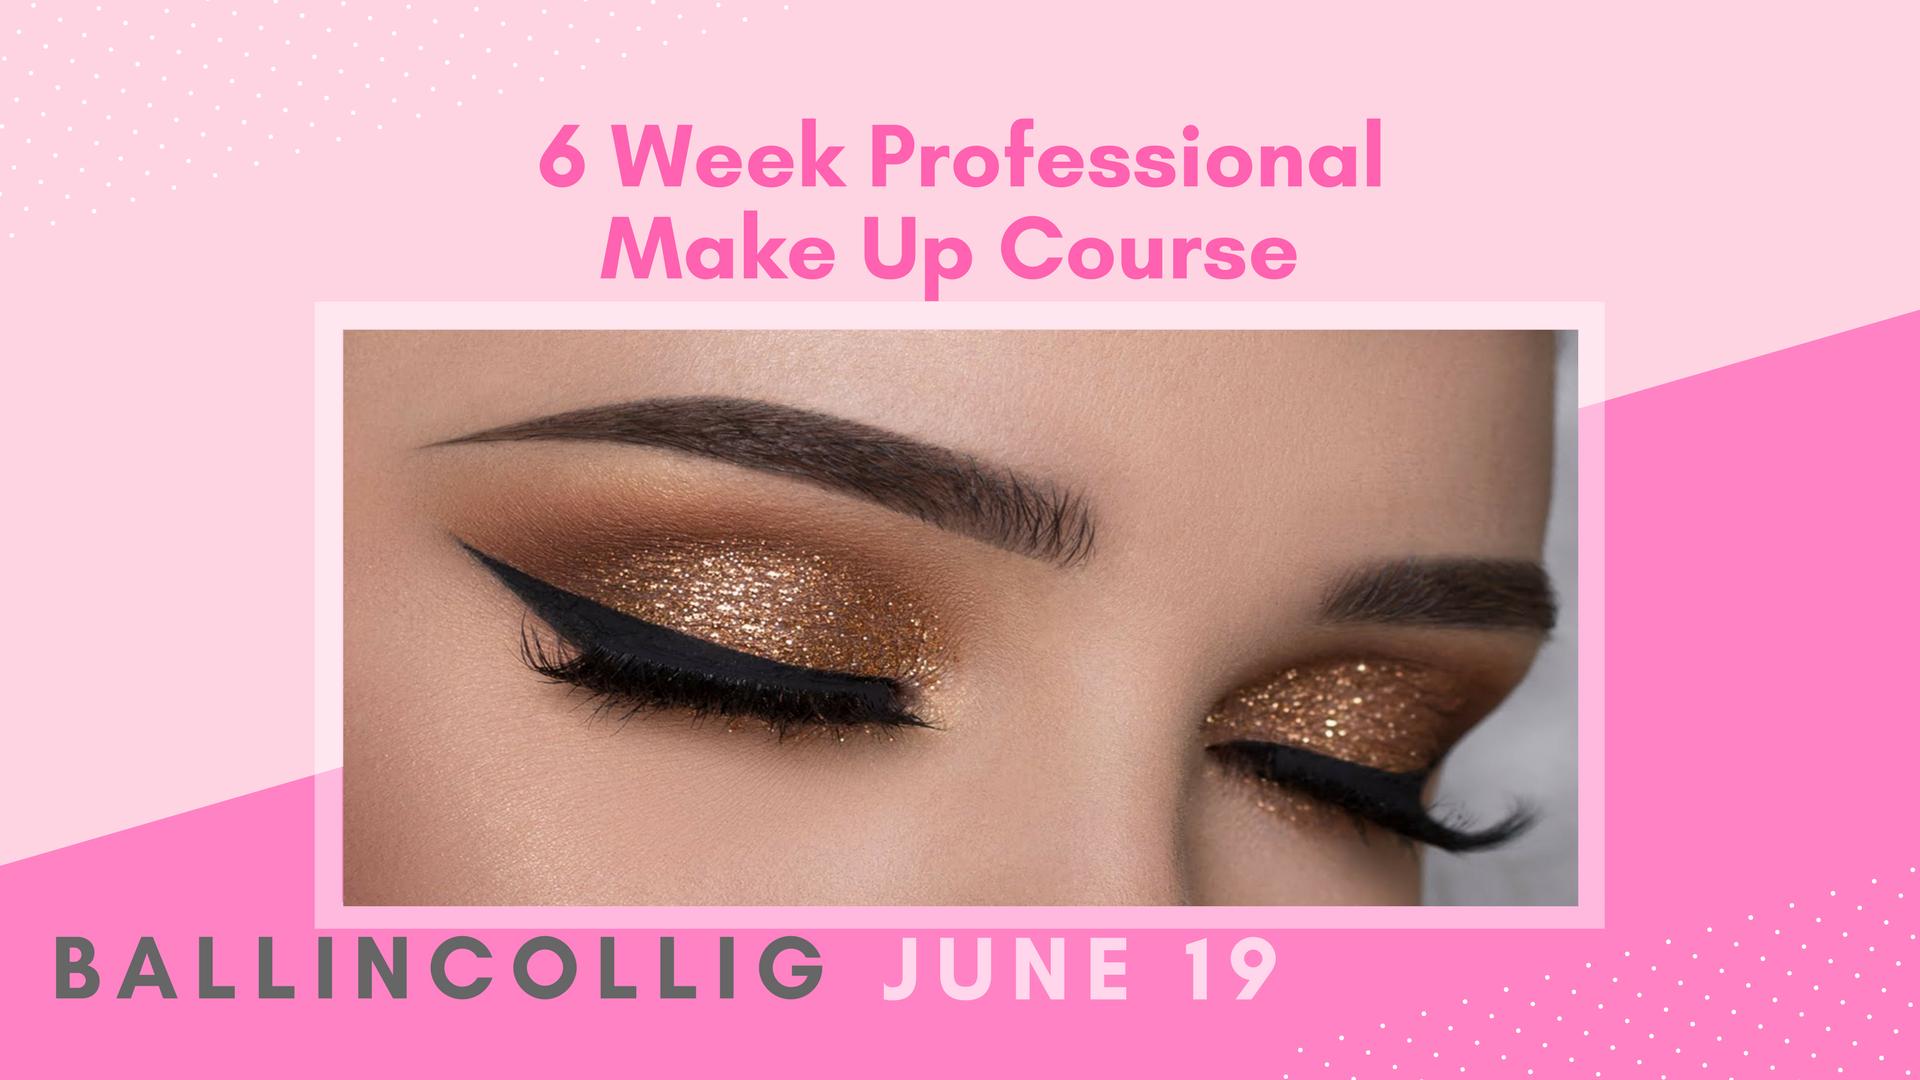 6 Week Professional Make Up Course - Ballincollig - Jun 19